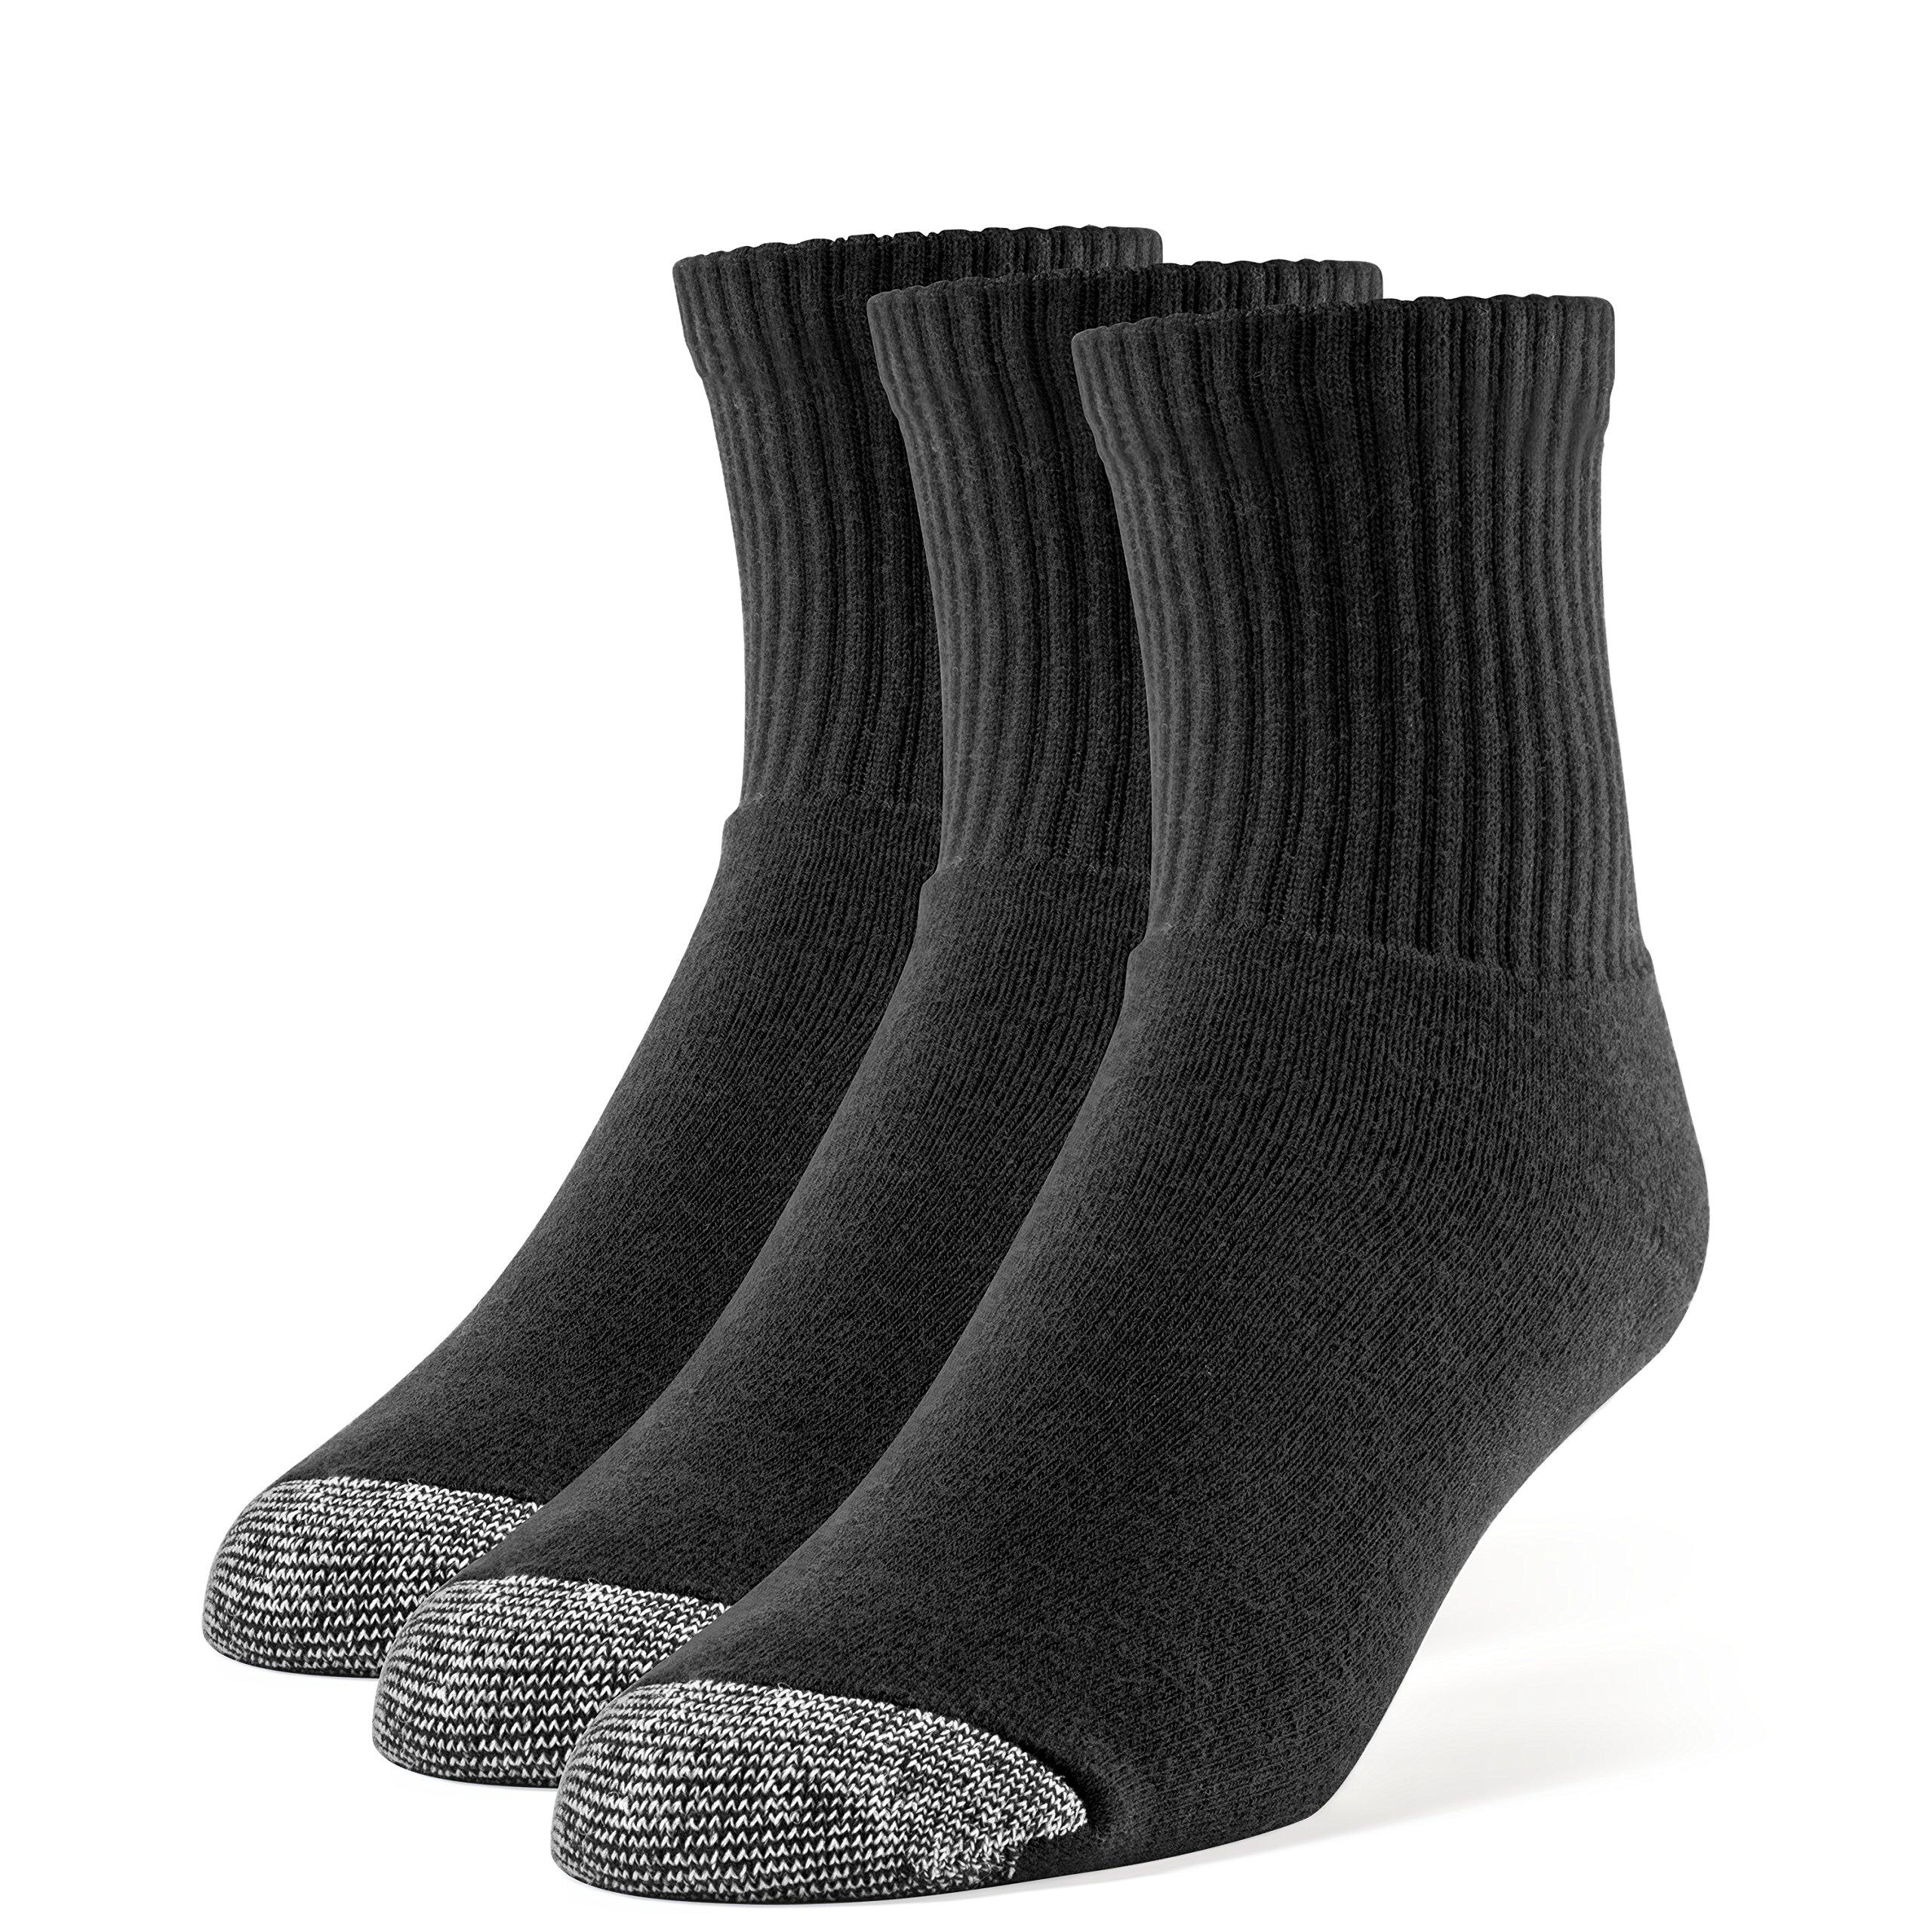 Galiva Women's Cotton Extra Soft Quarter Cushion Socks - 3 Pairs, Small, Black